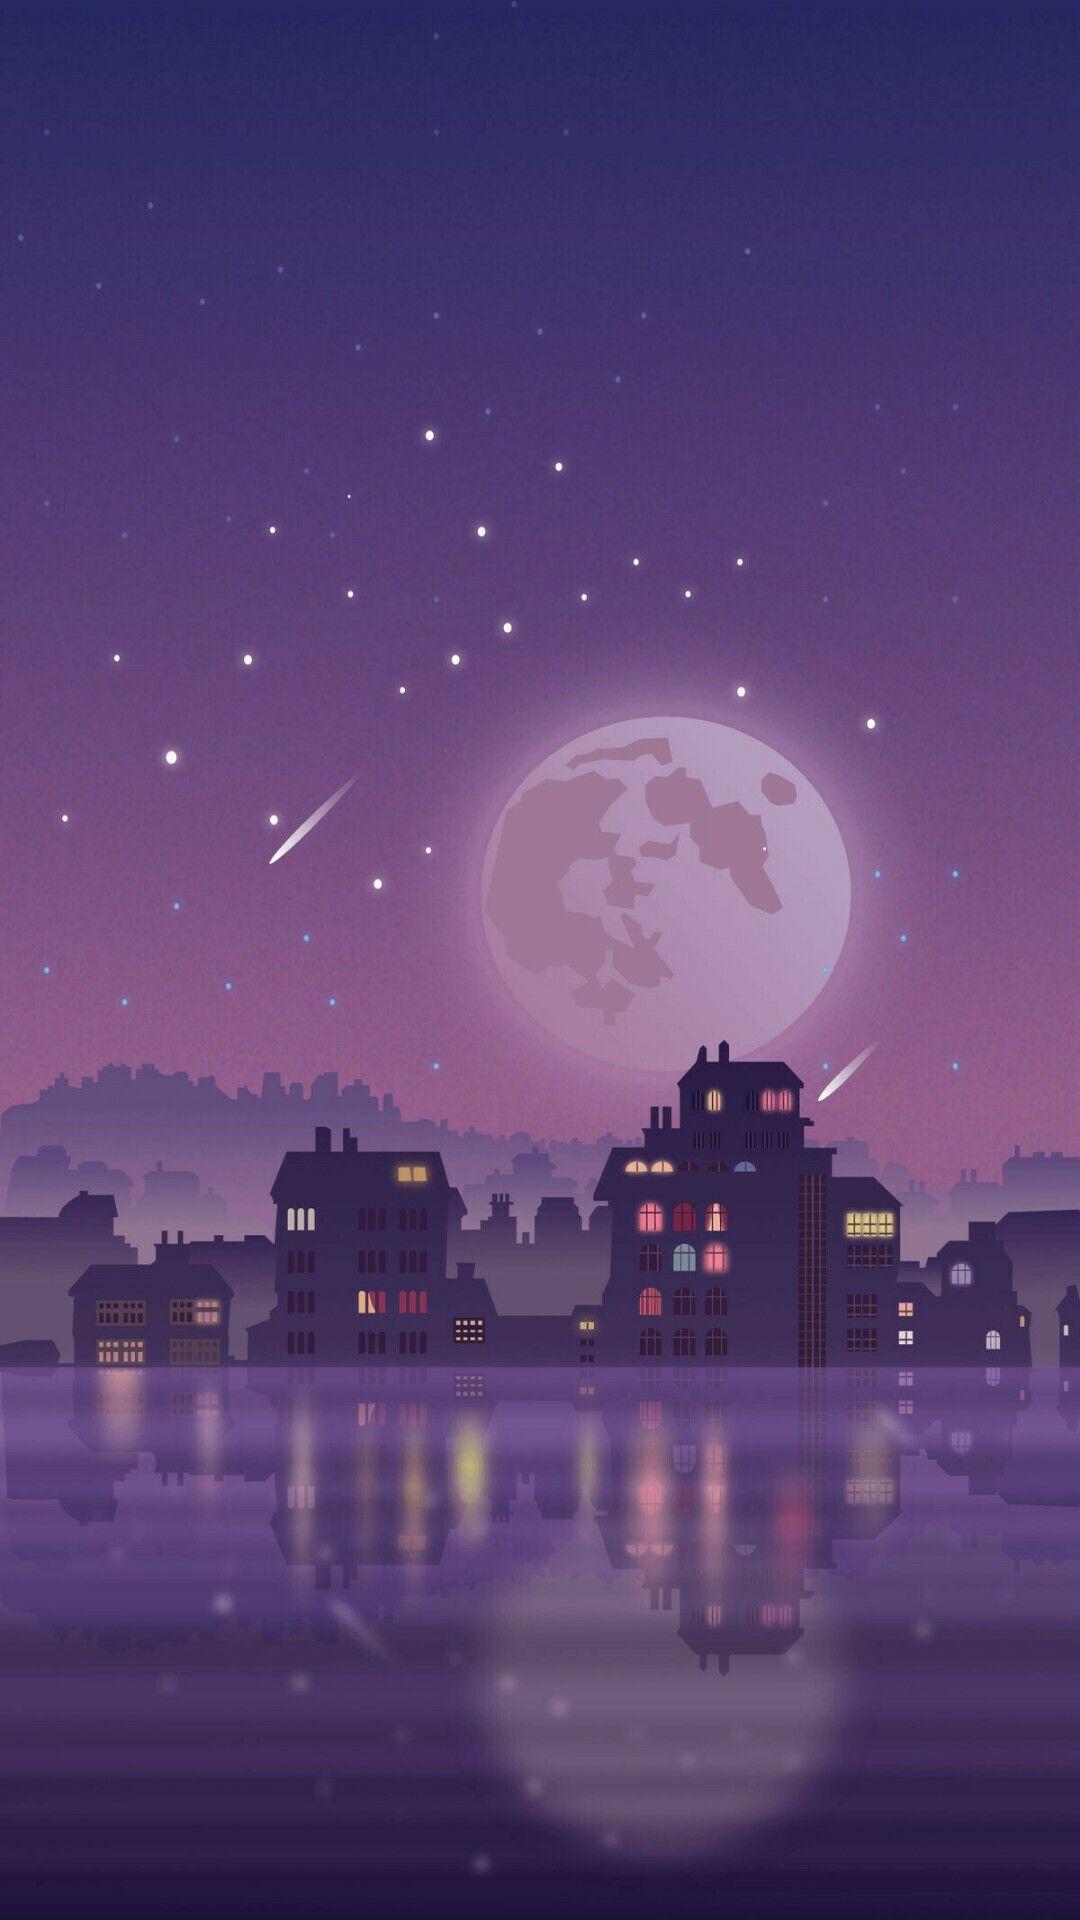 Pin By Sossy Shpp On Phone Backgrounds 24 Scenery Wallpaper Anime Wallpaper Art Wallpaper